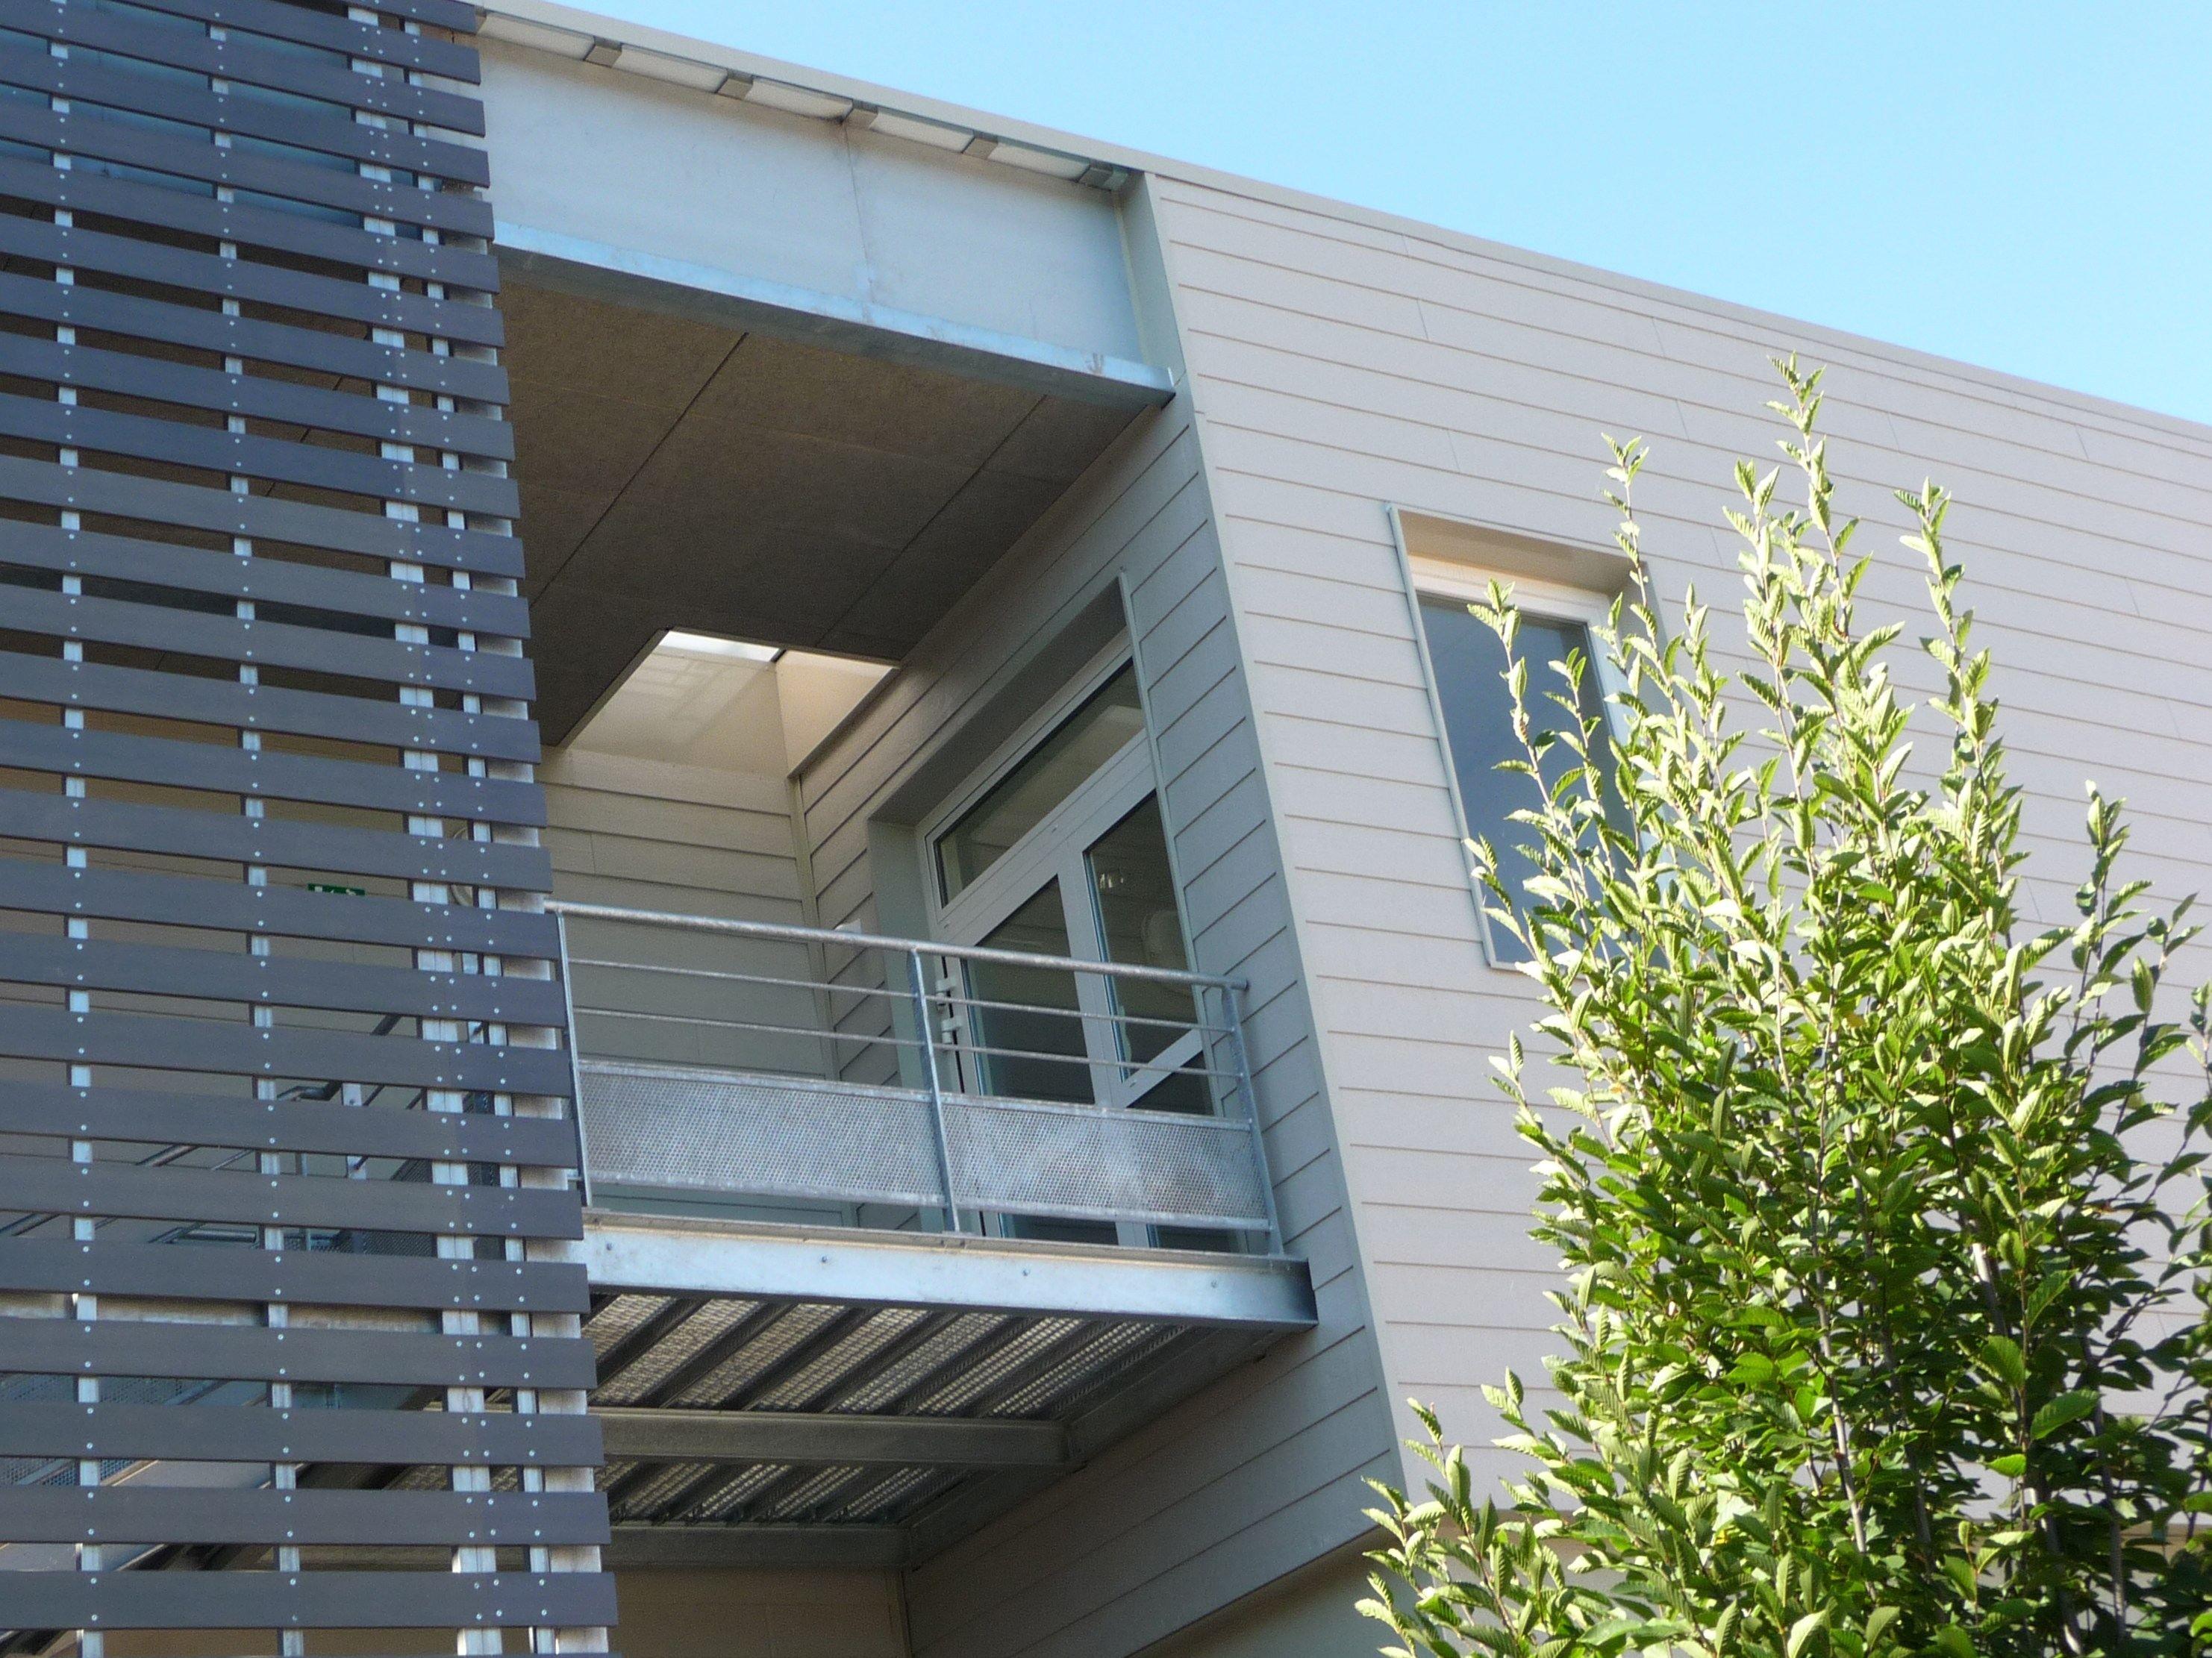 Panel de madera para fachada canexel ced r tex by canexel - Recubrimientos para fachadas ...